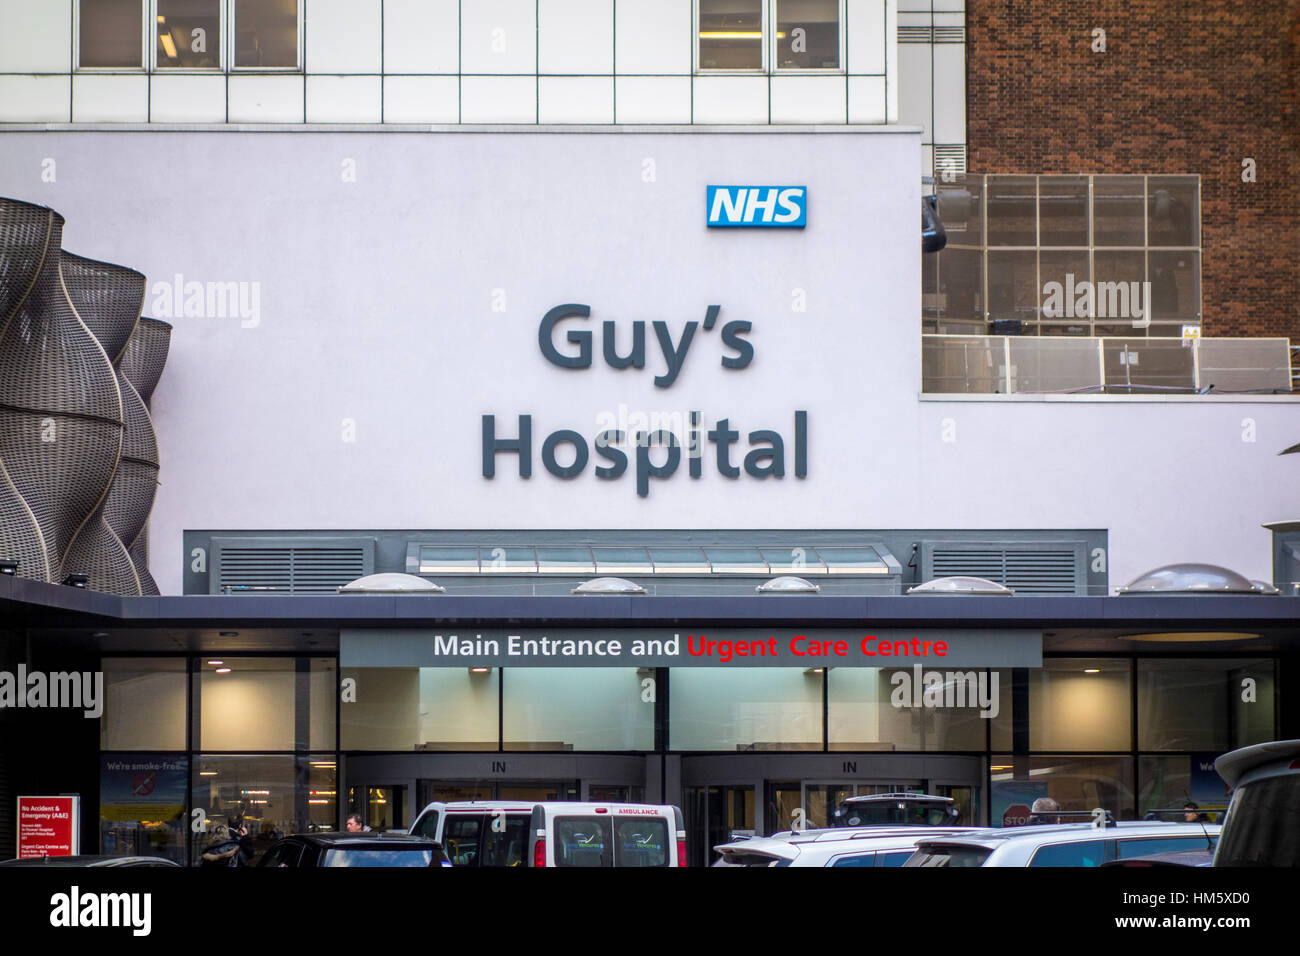 Guy's Hospital NHS, Haupteingang, London, UK Stockbild